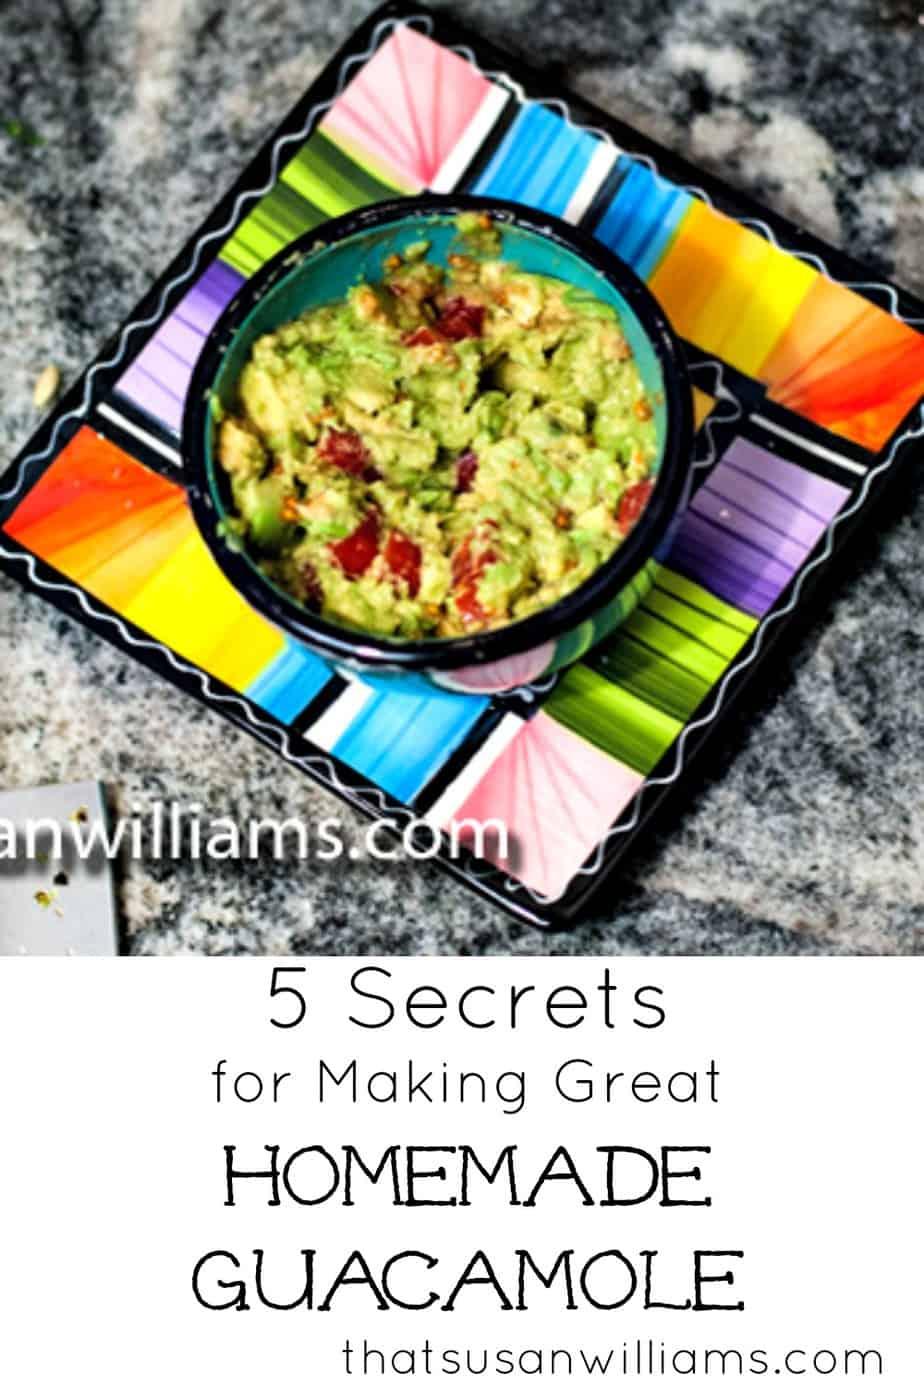 Easy to make Homemade Guacamole Recipe #guacamole #homemade #cincodemayo